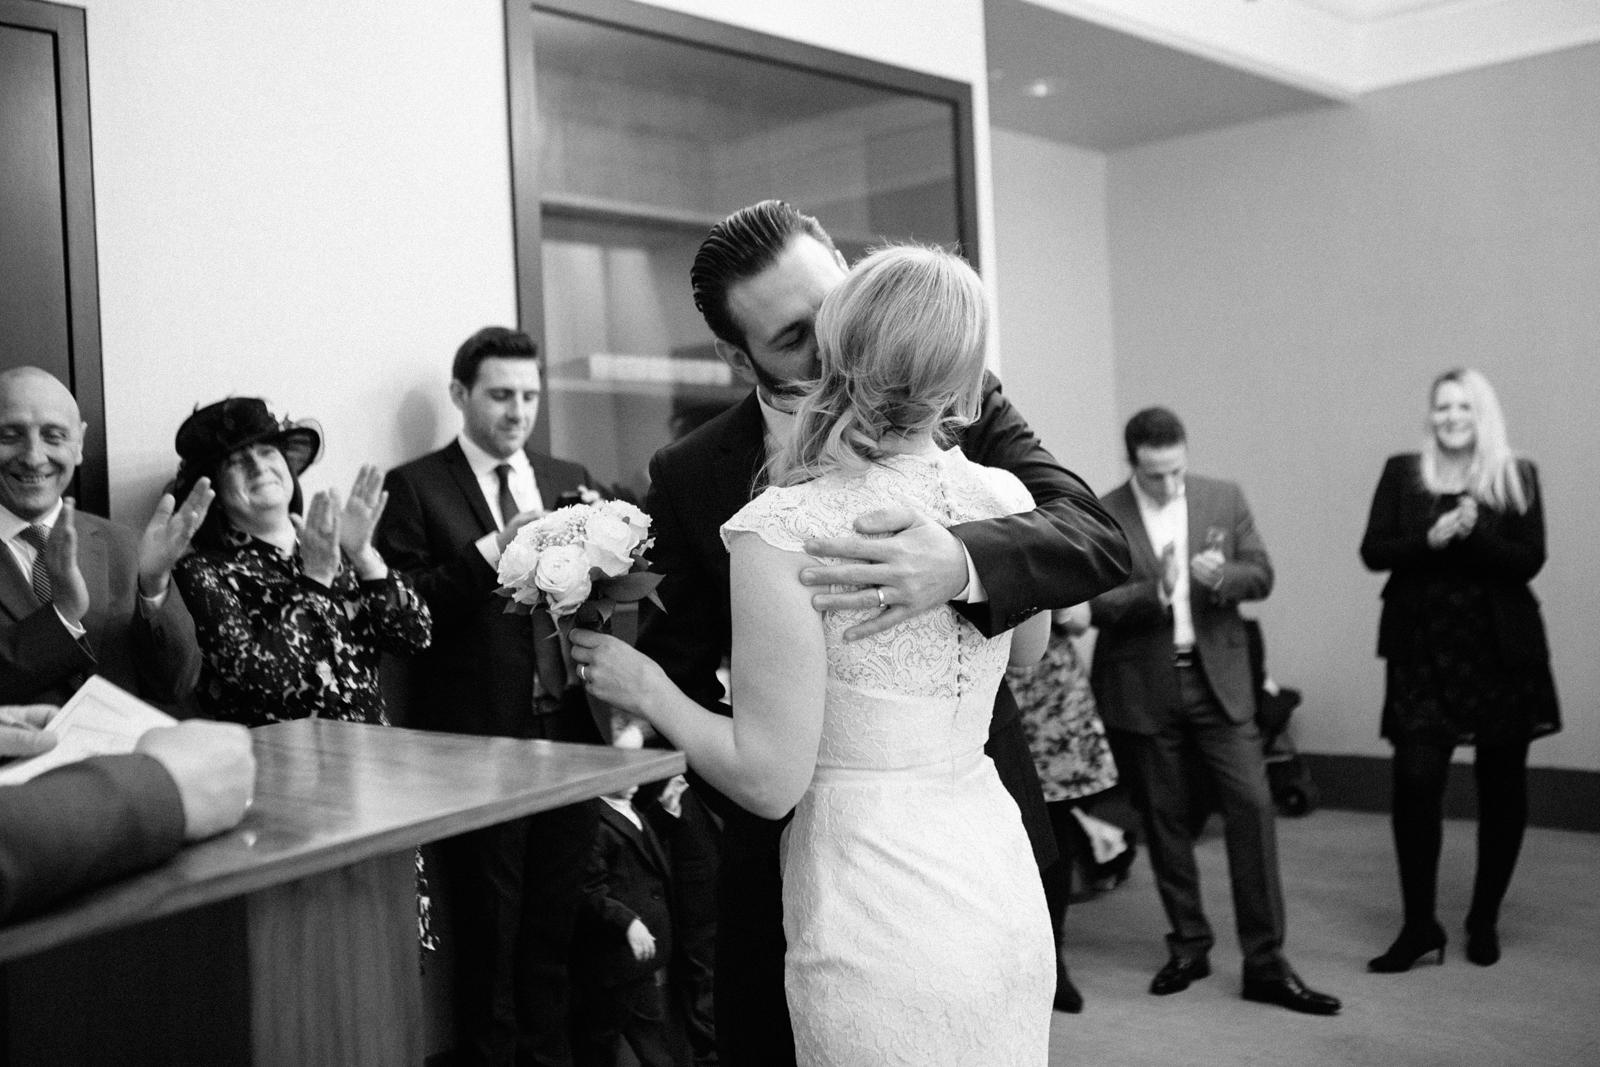 marriage bureau wedding ceremony new york